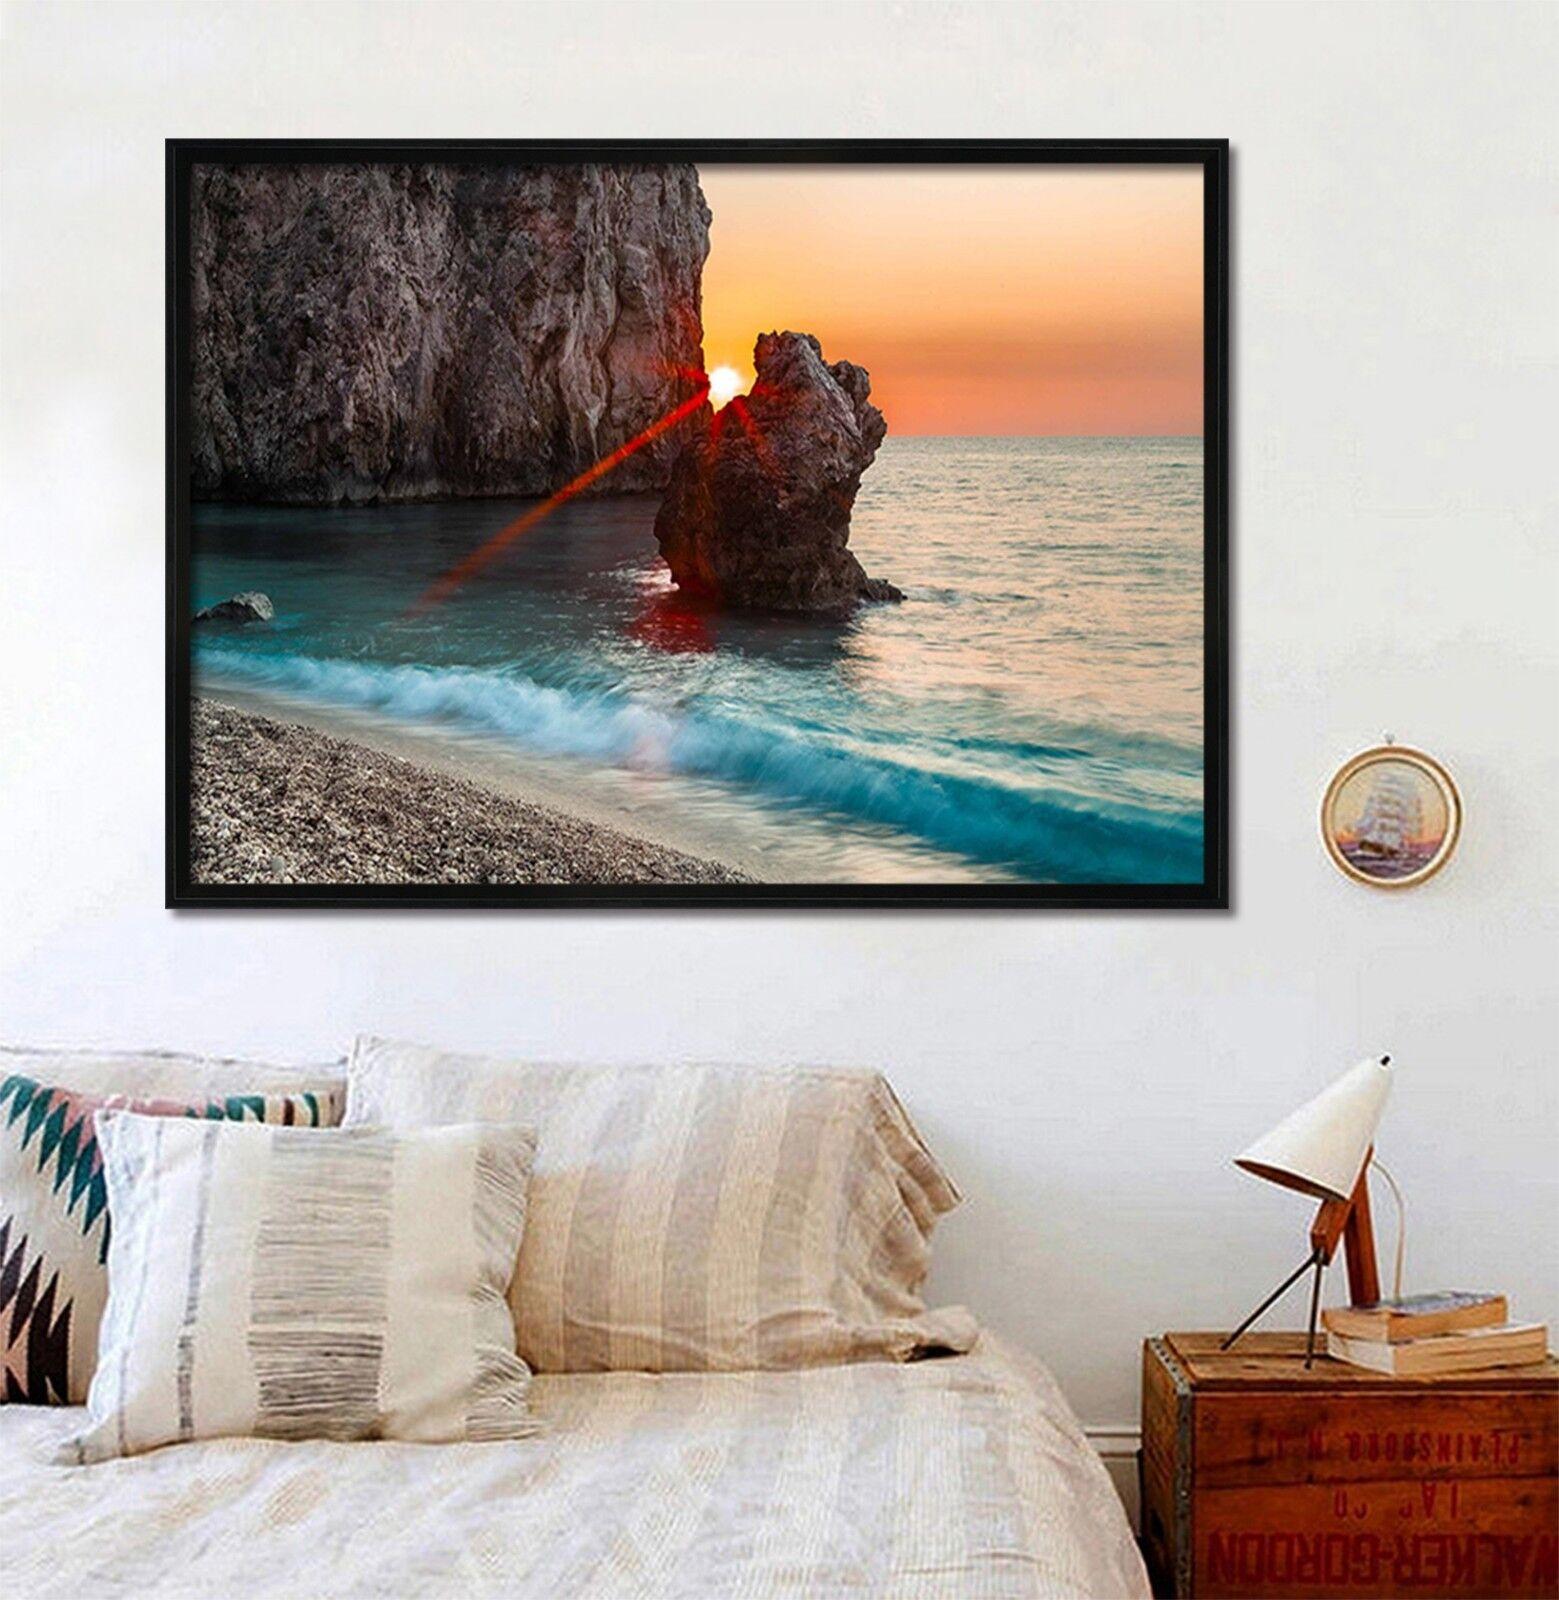 3D Sun Beach 667 Fake Framed Poster Home Decor Print Painting Unique Art Summer